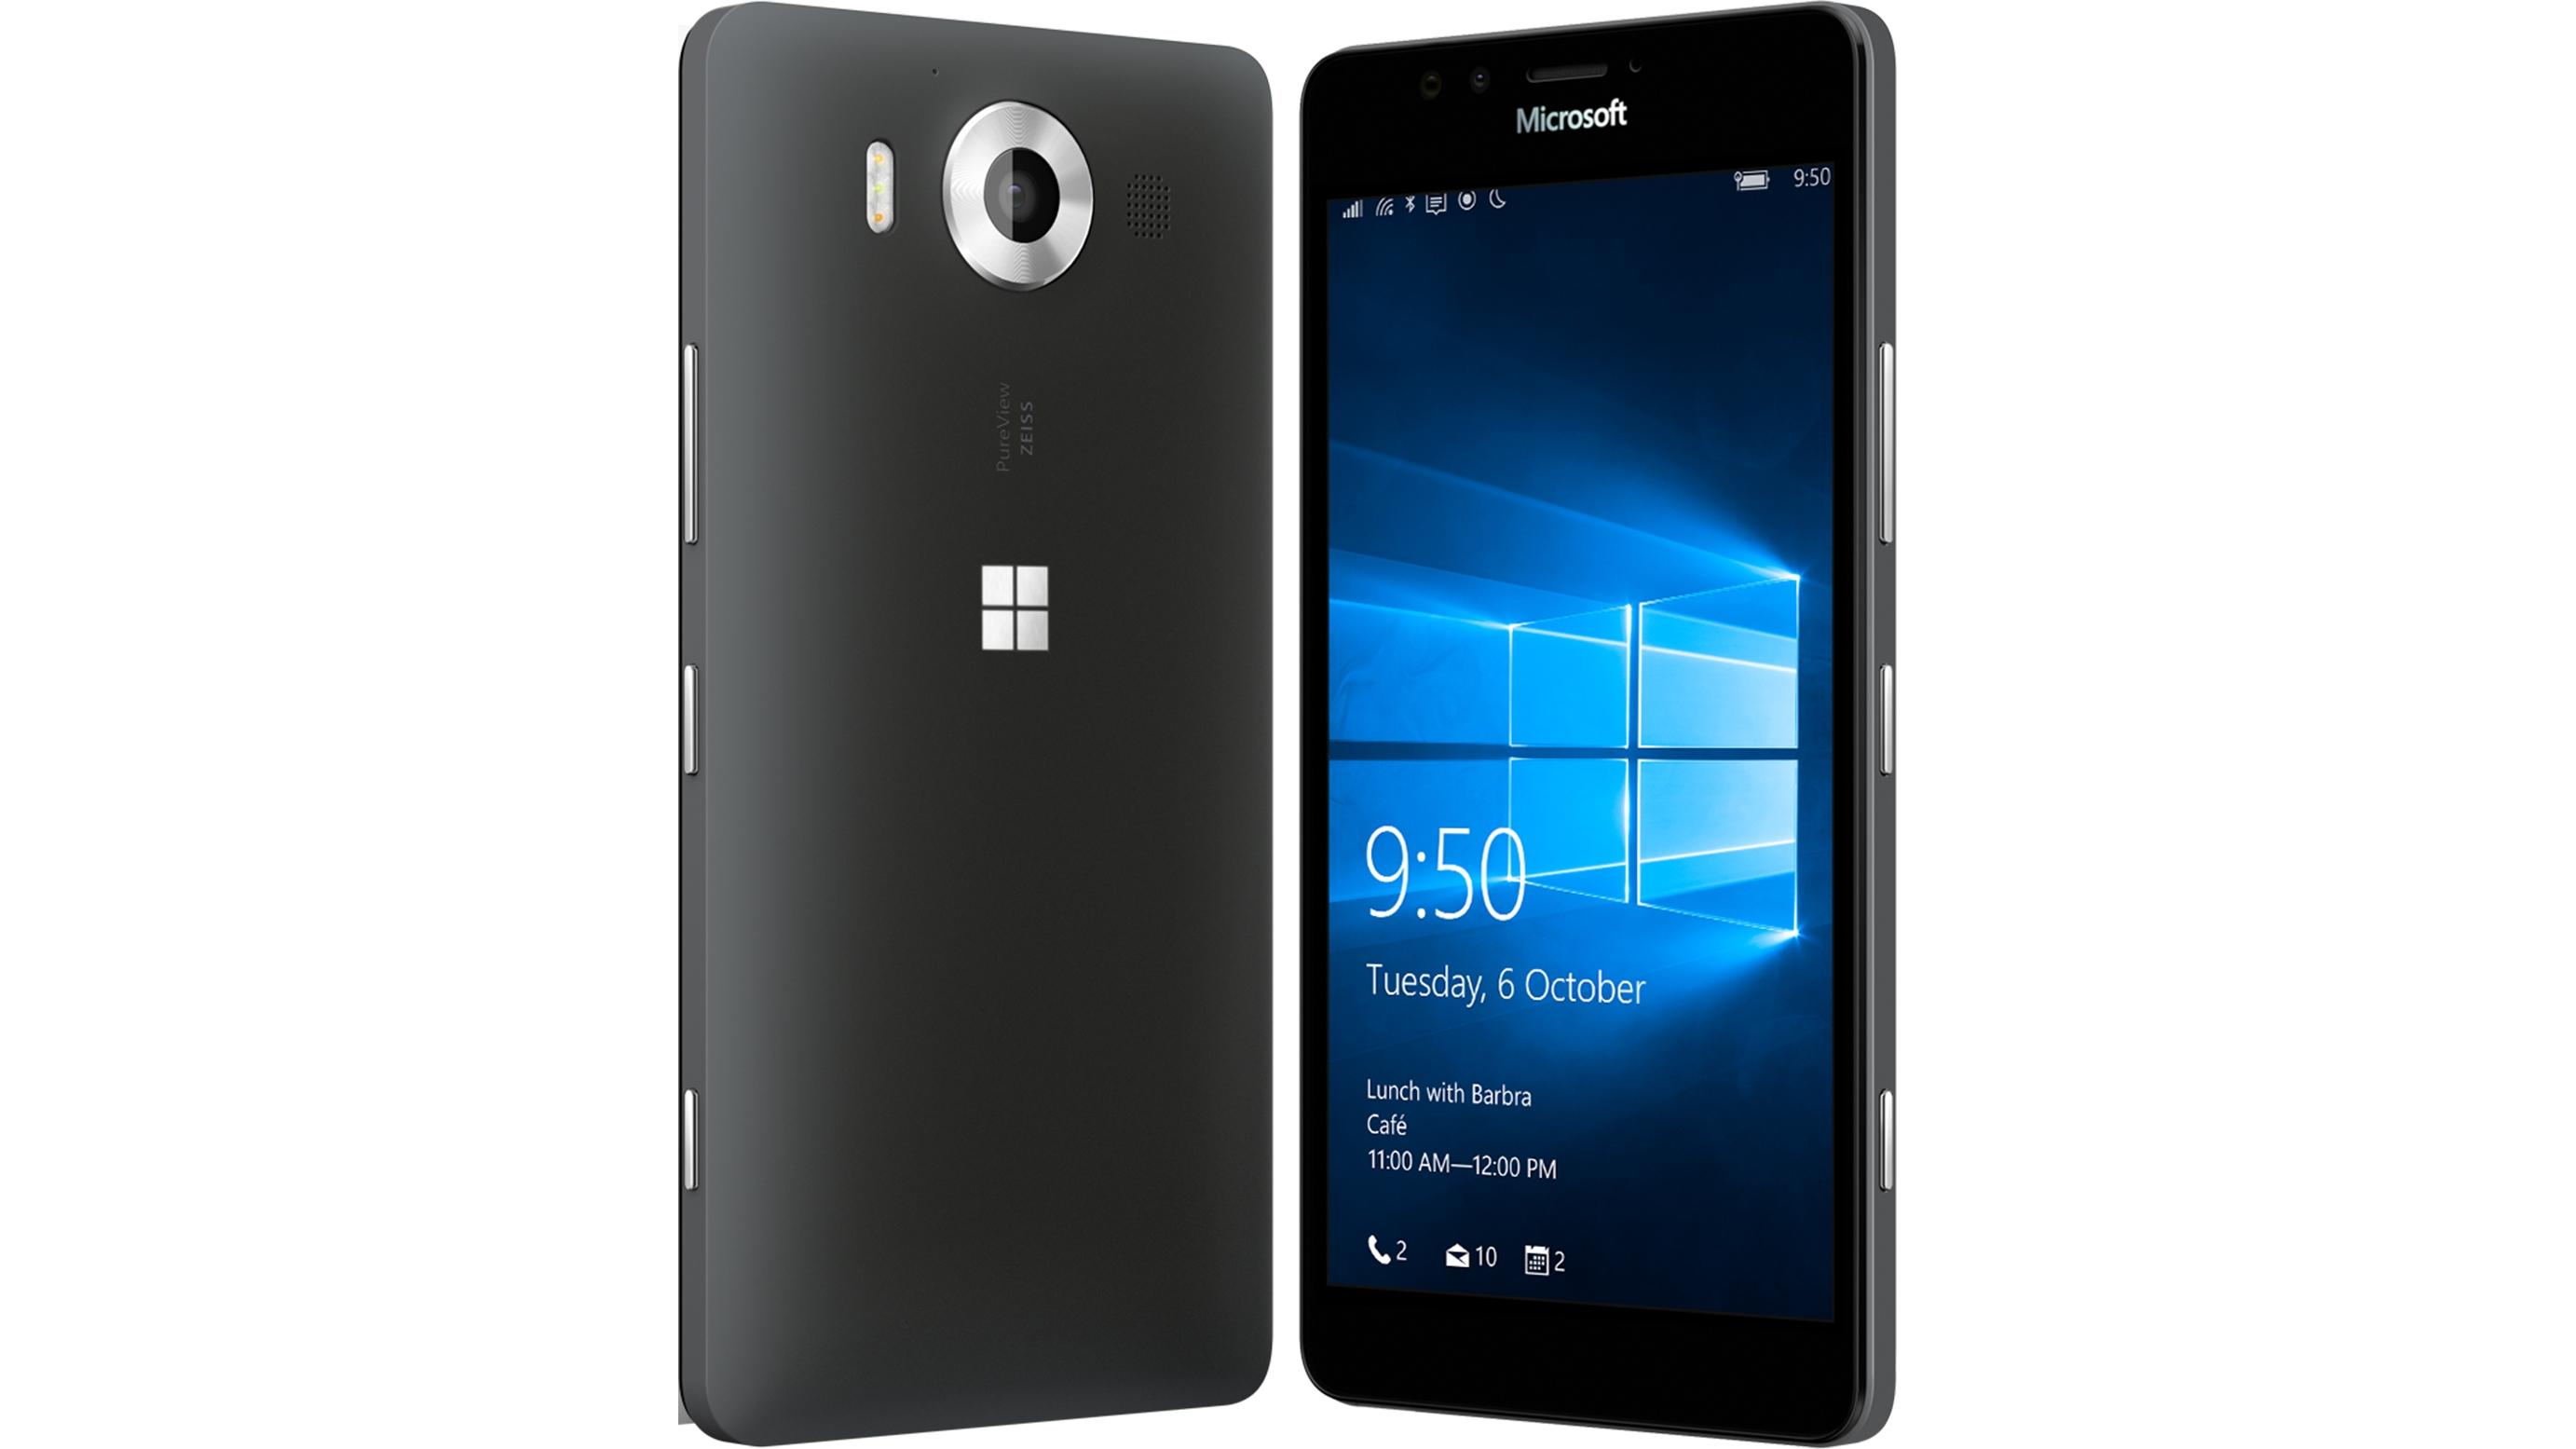 microsoft lumia 950. microsoft lumia 950 - black front and back view e